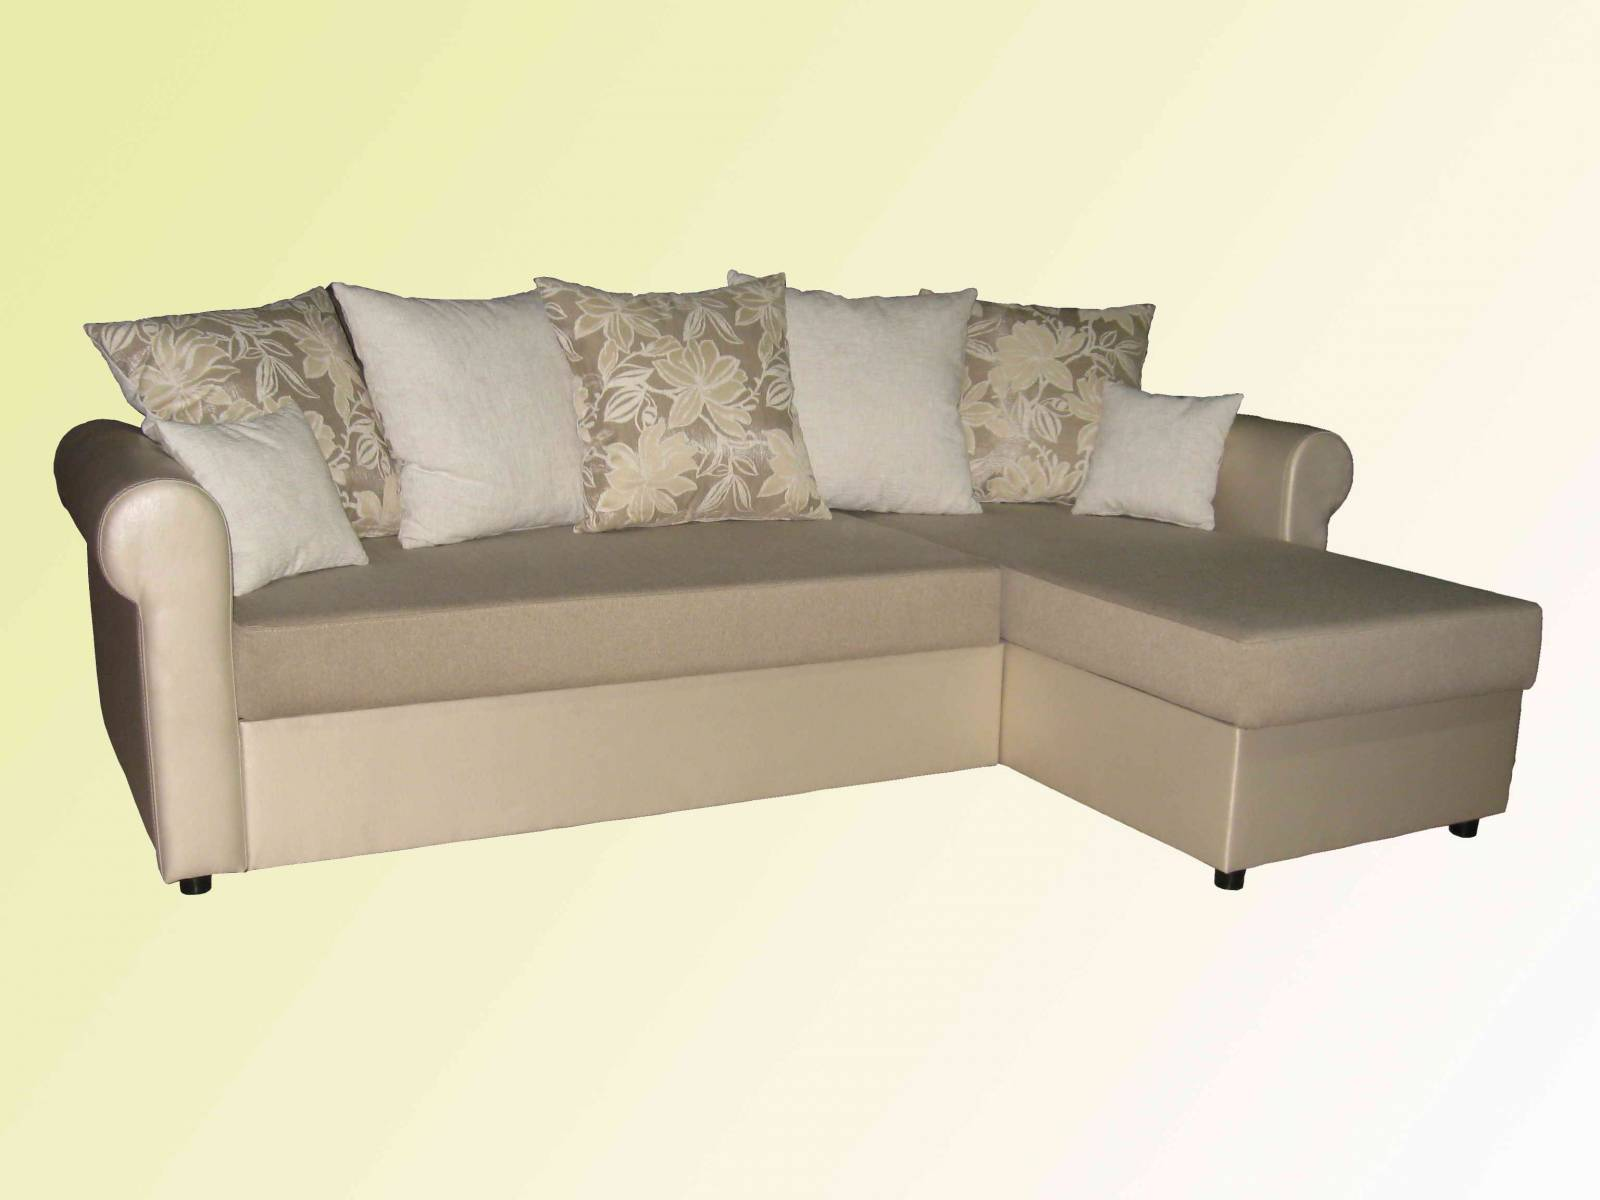 Ульяновская мягкая мебель